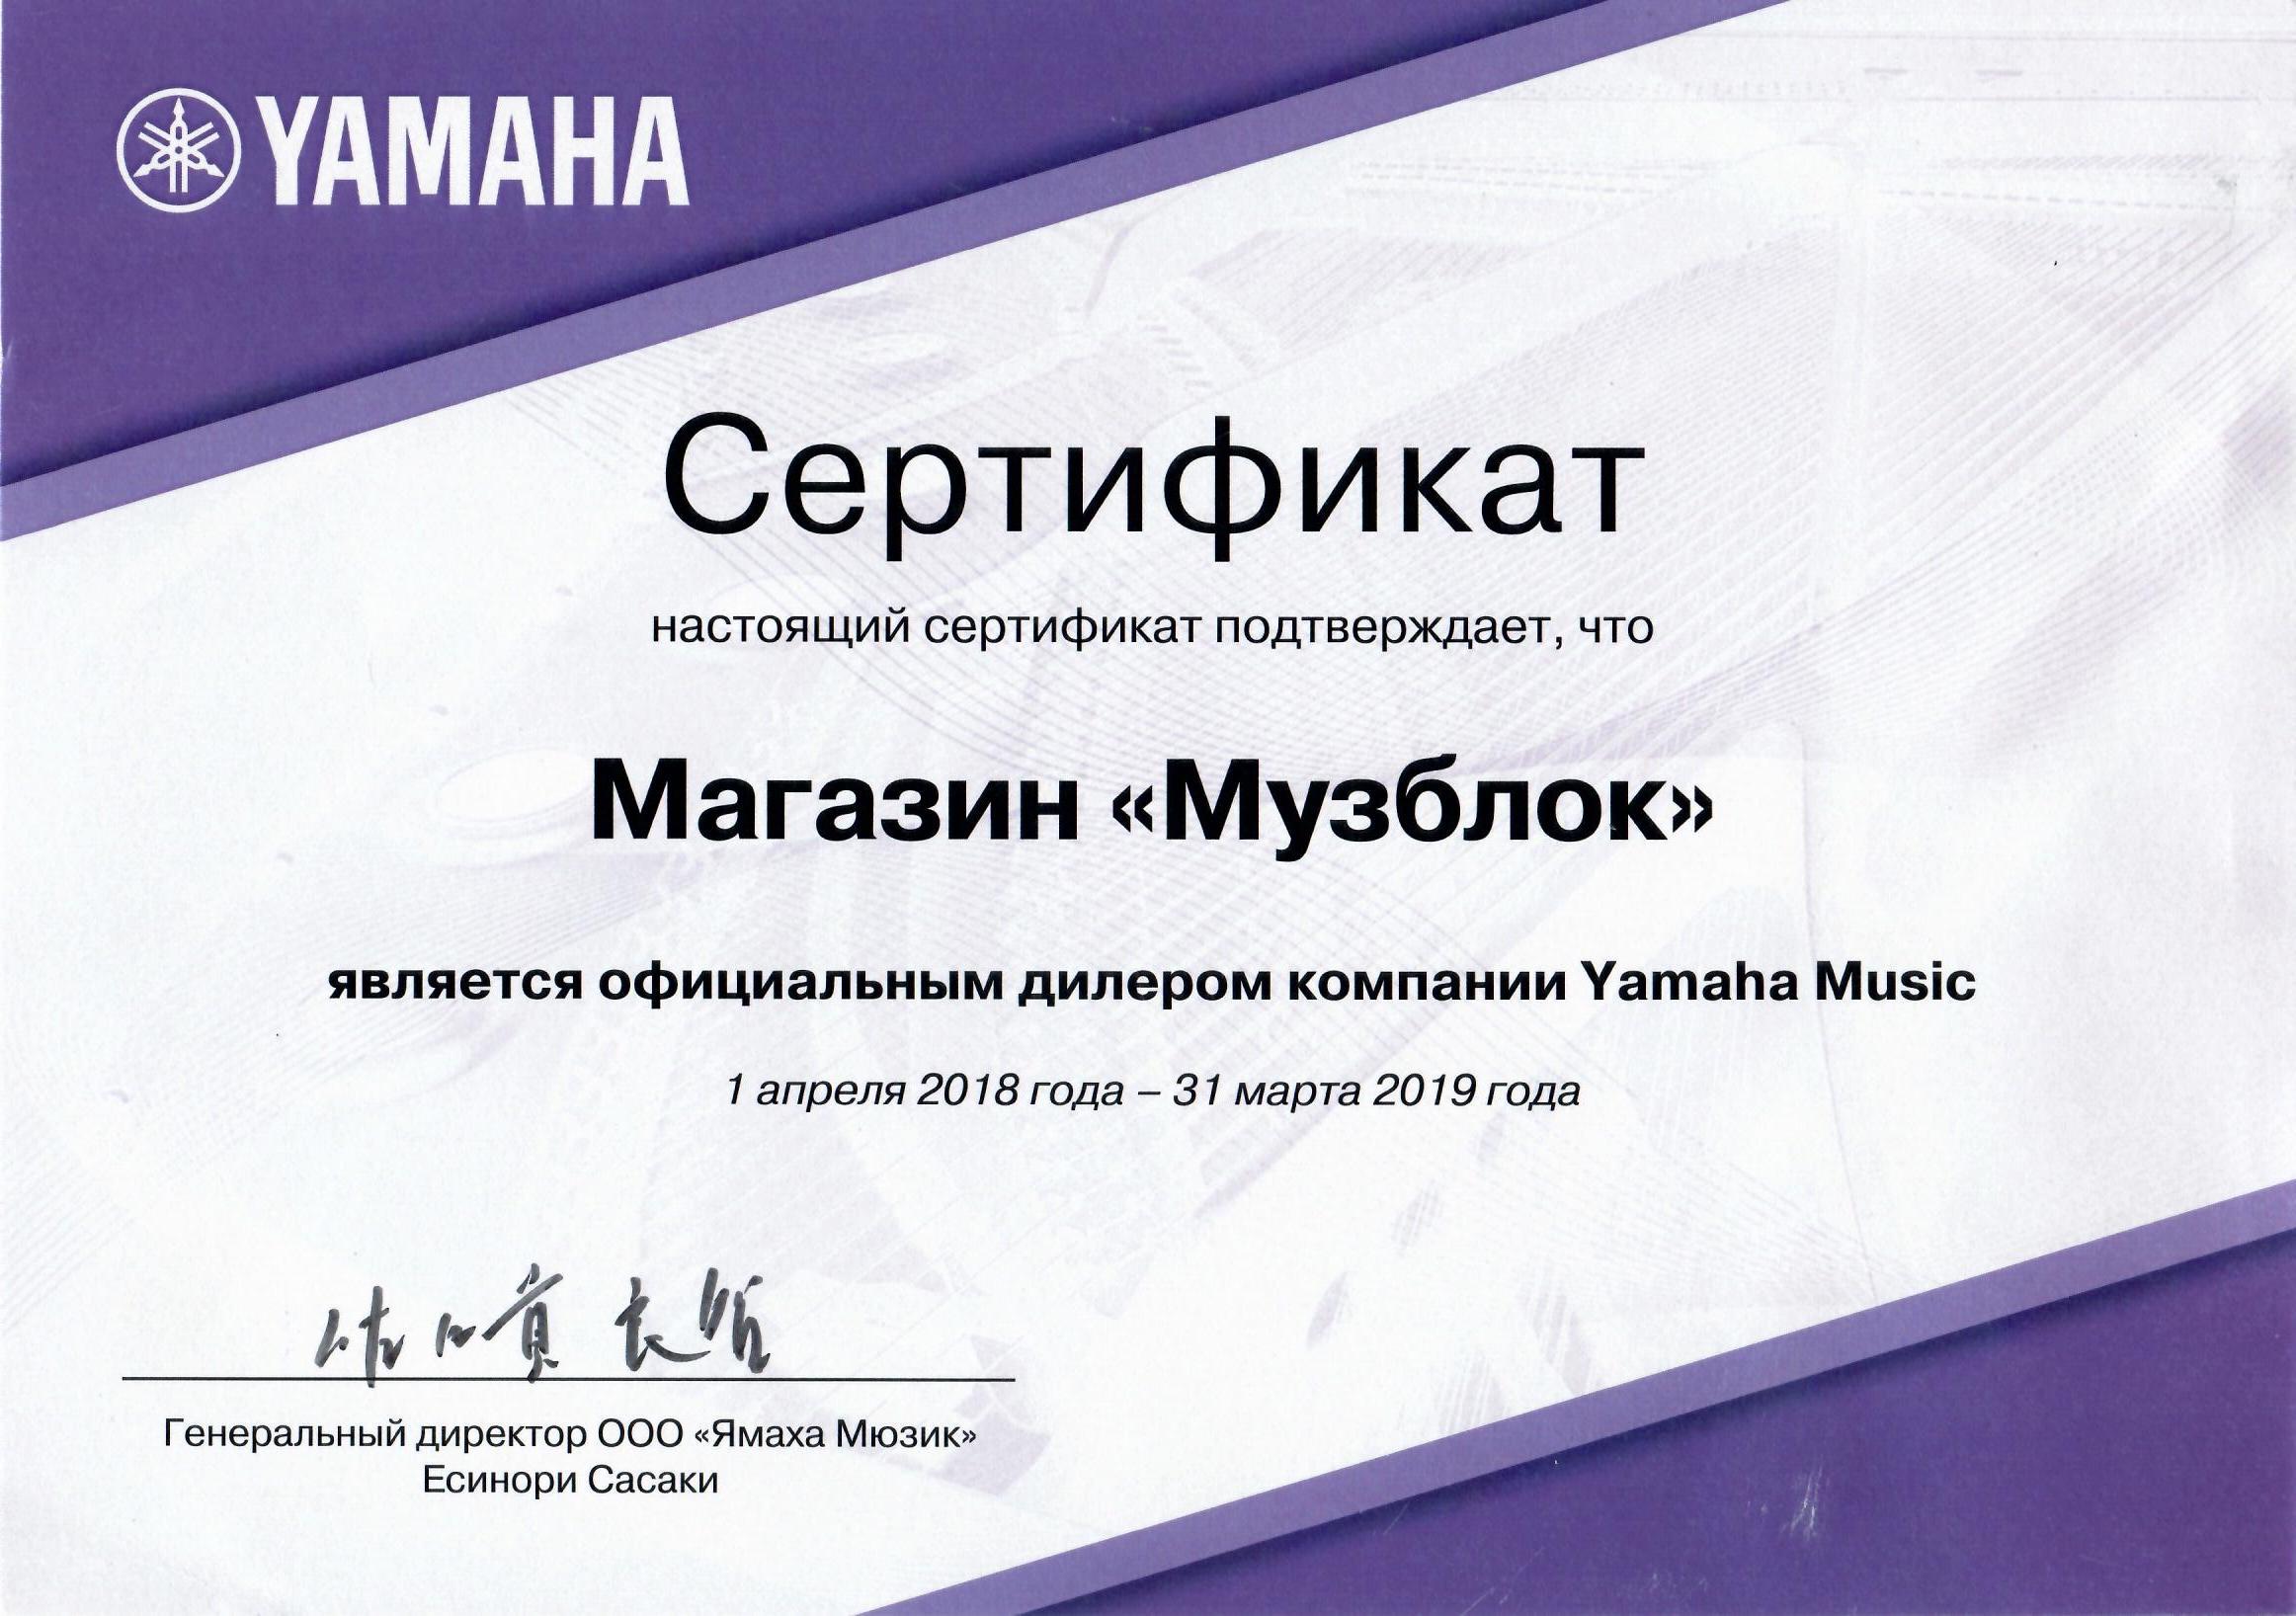 Музблок, сертификат дилера Ямаха 2018